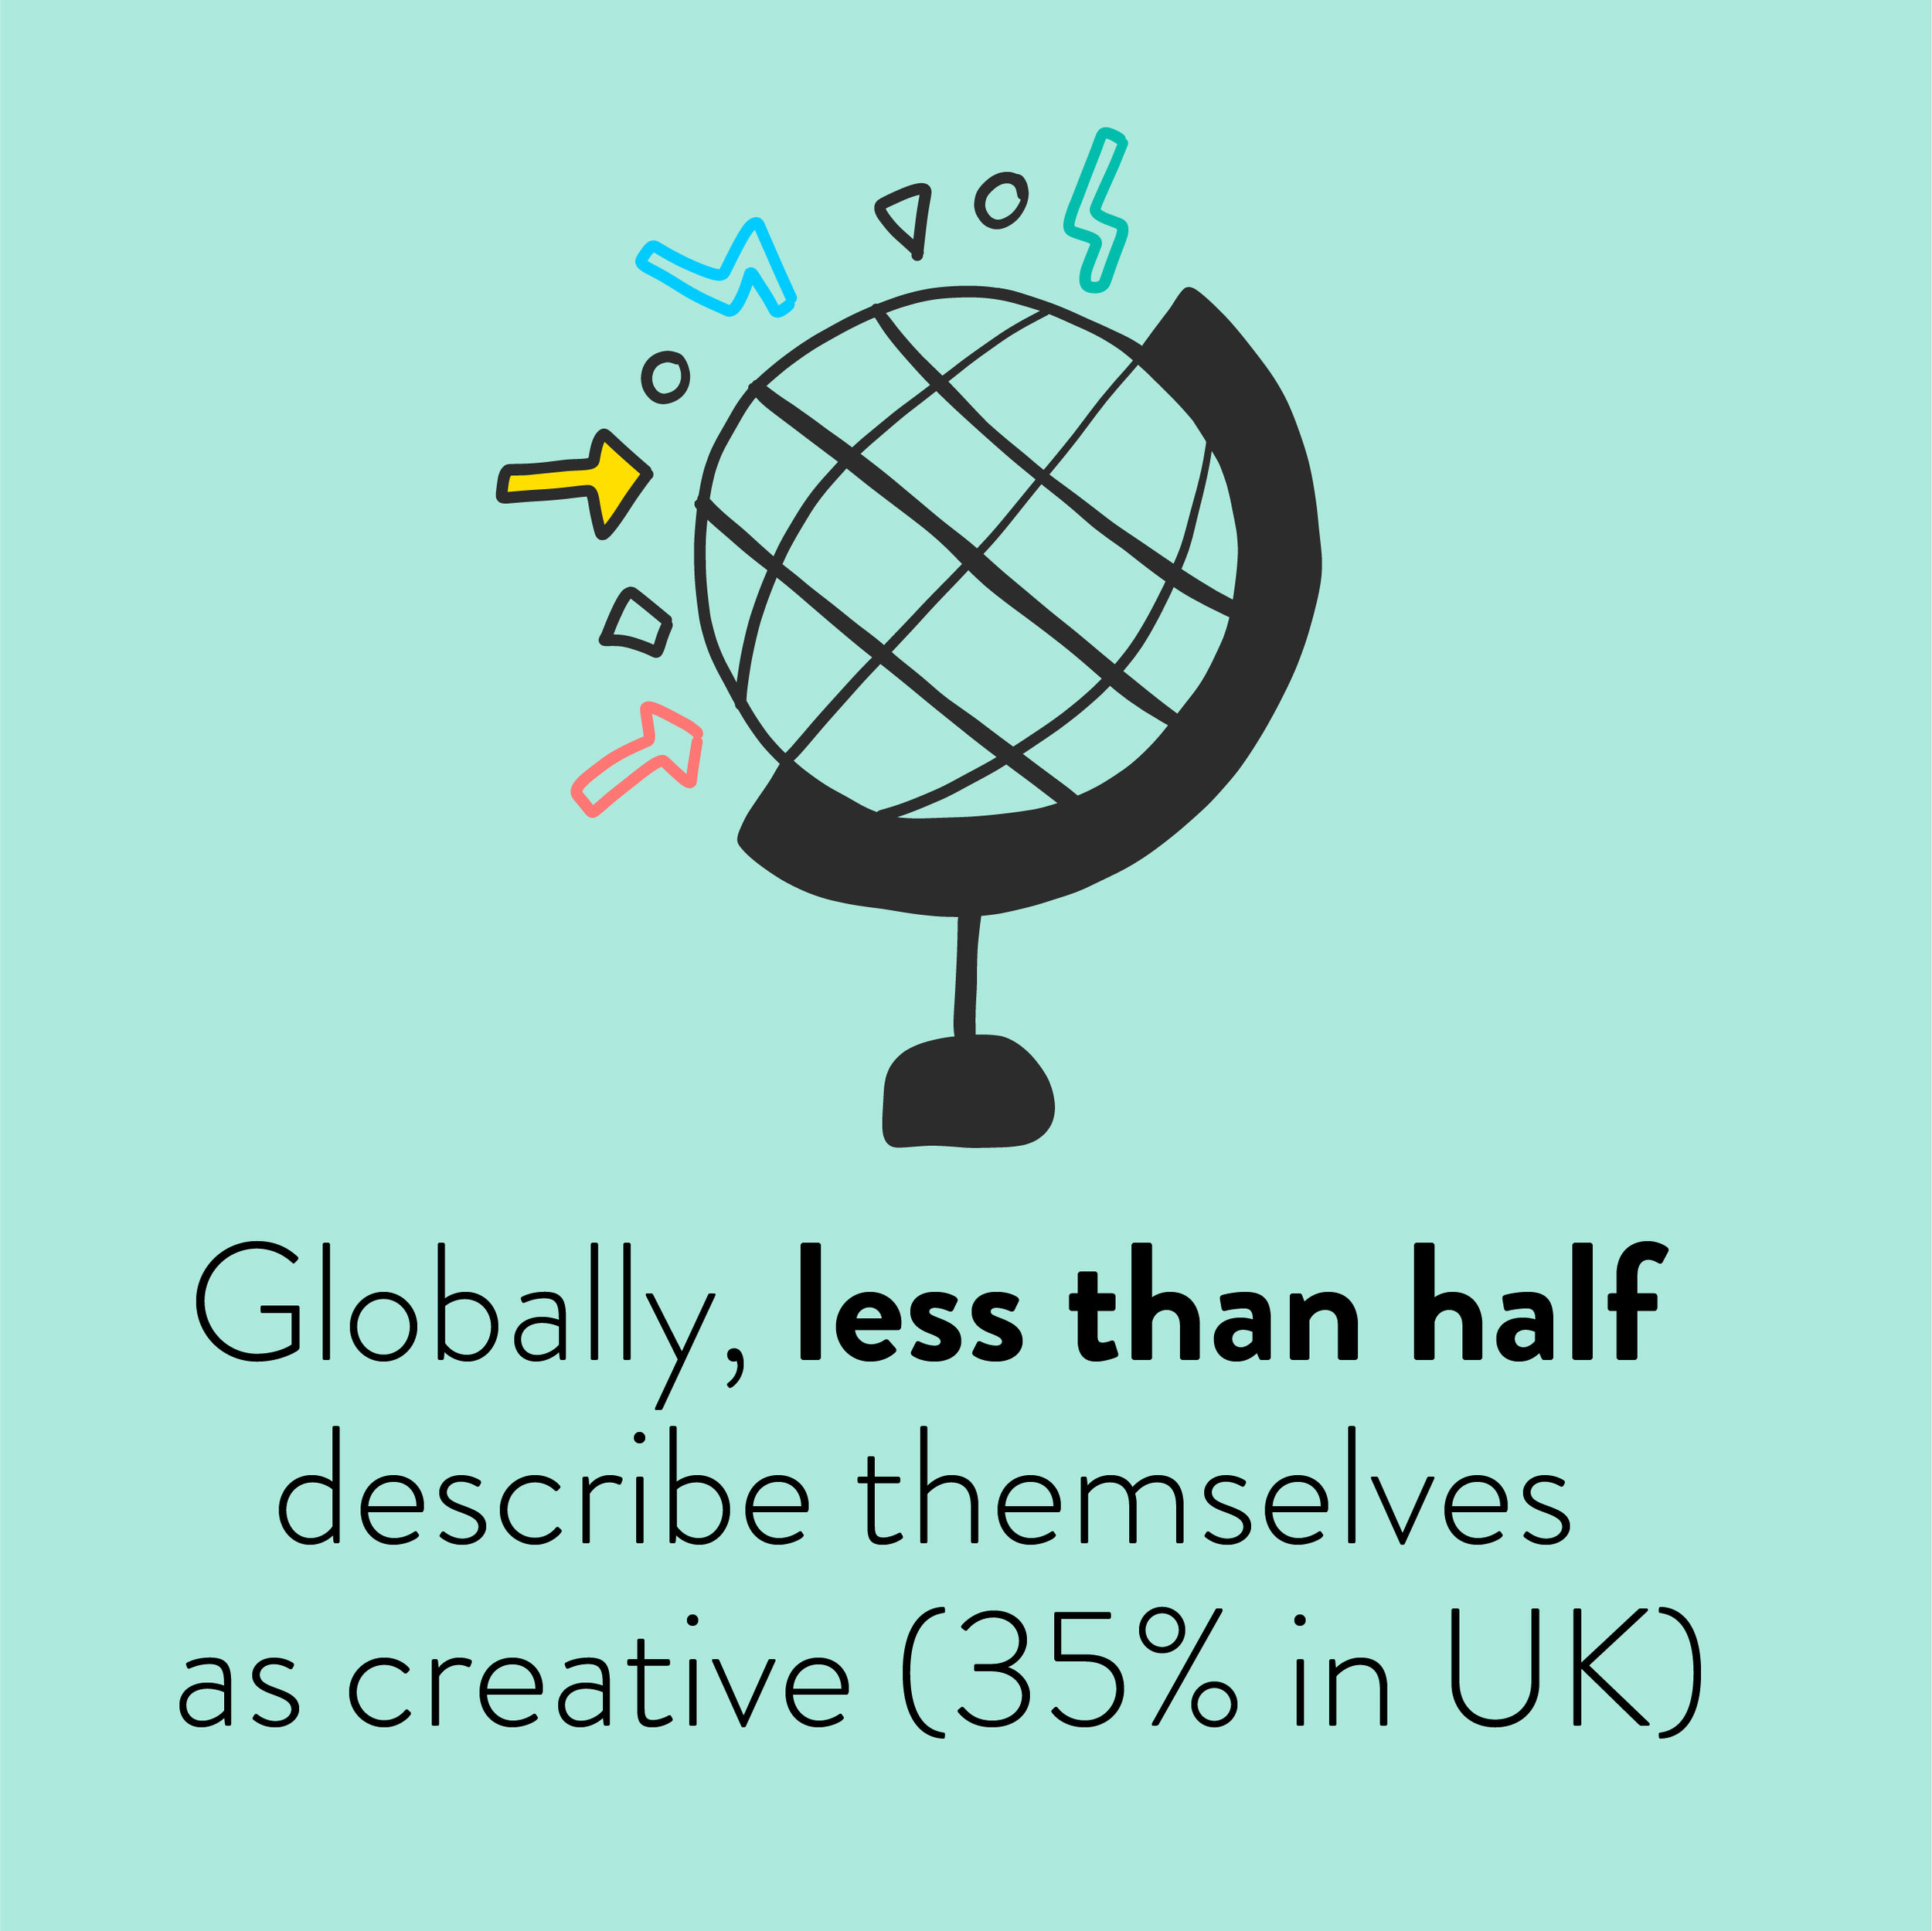 Creativity globally